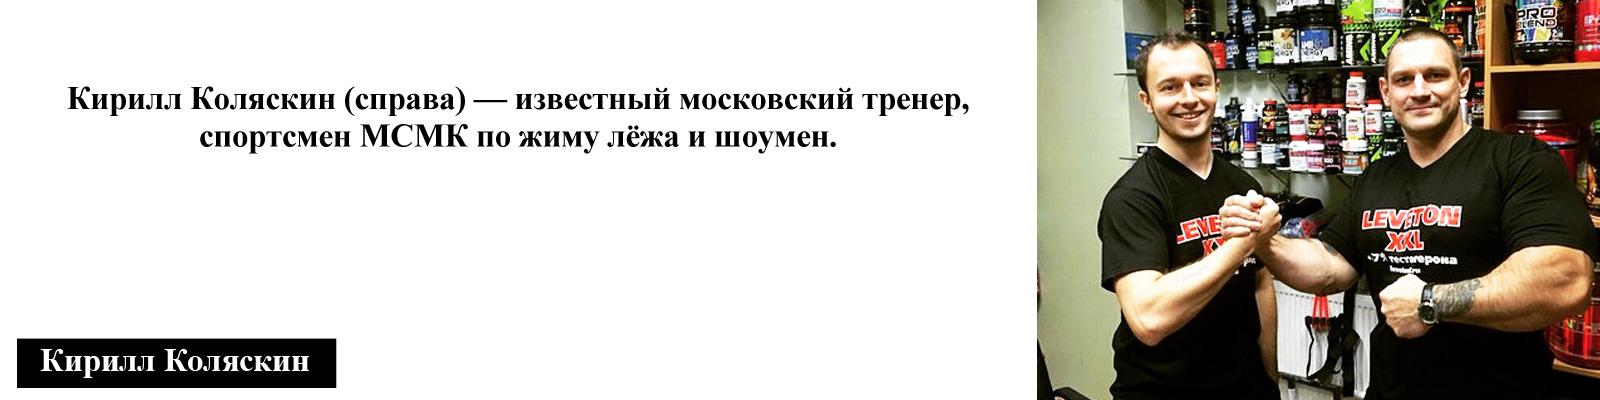 коляскин